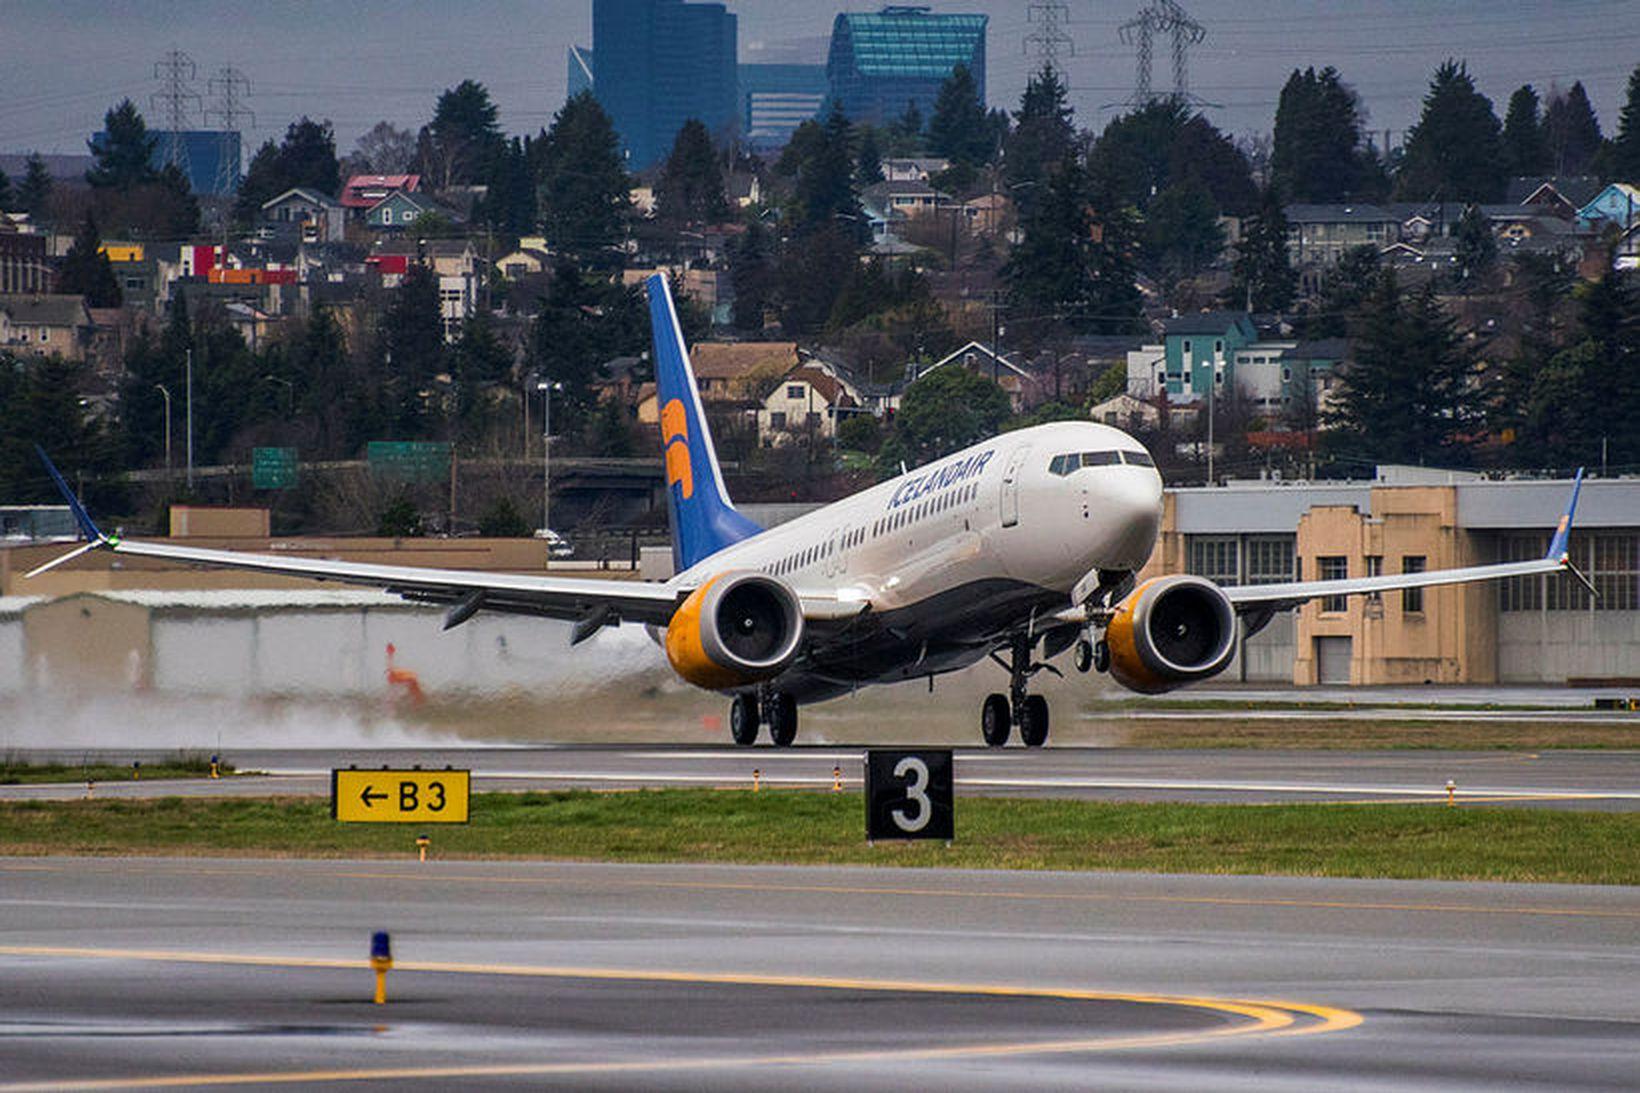 Boeing 737 Max-flugvél Icelandair.